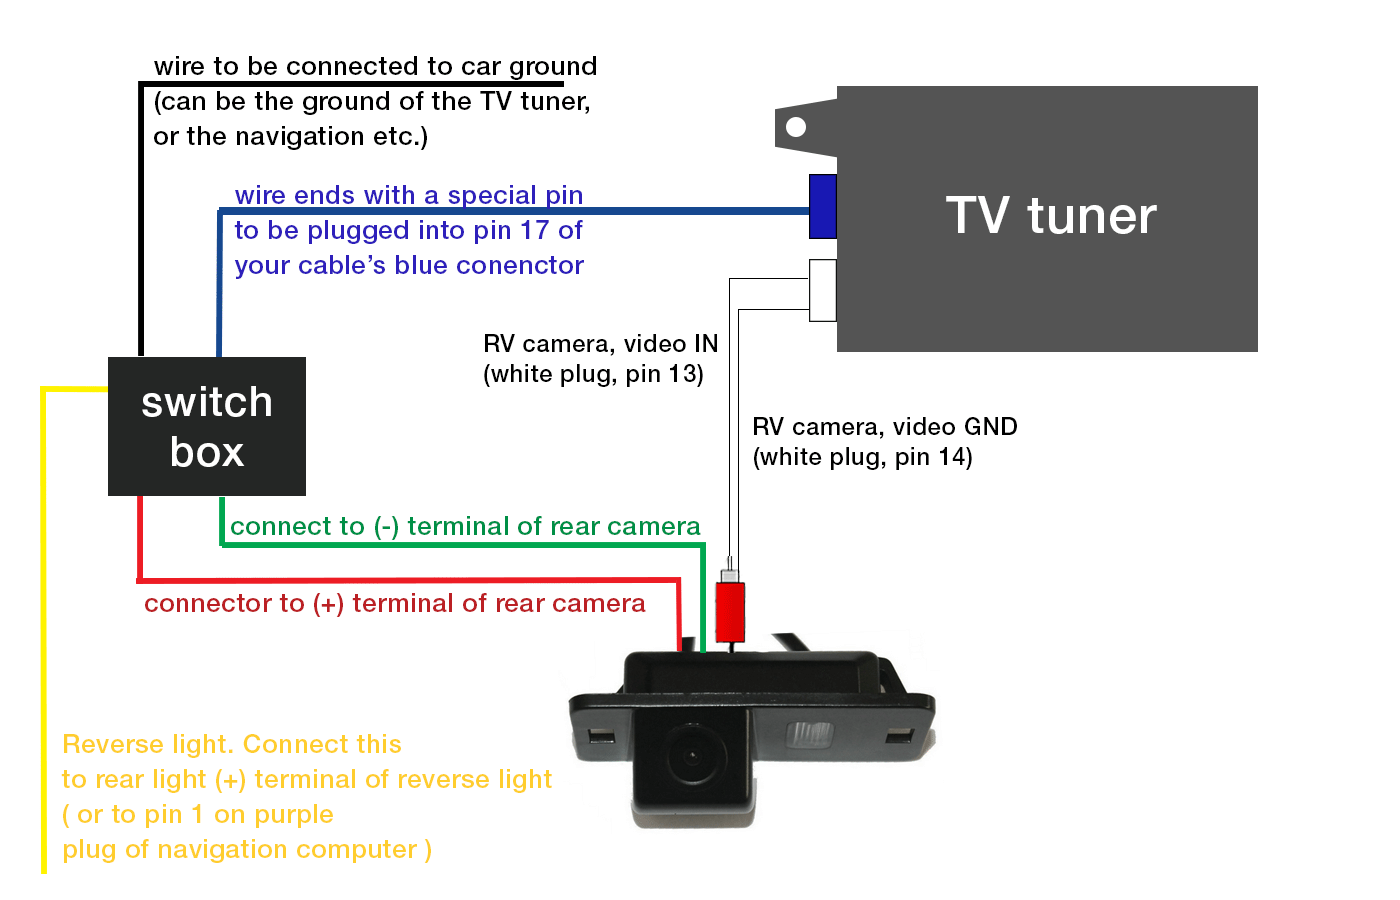 Module amplifier professional bmw e38 e39 e46 x5 e53 bmw - Here S An Illustration